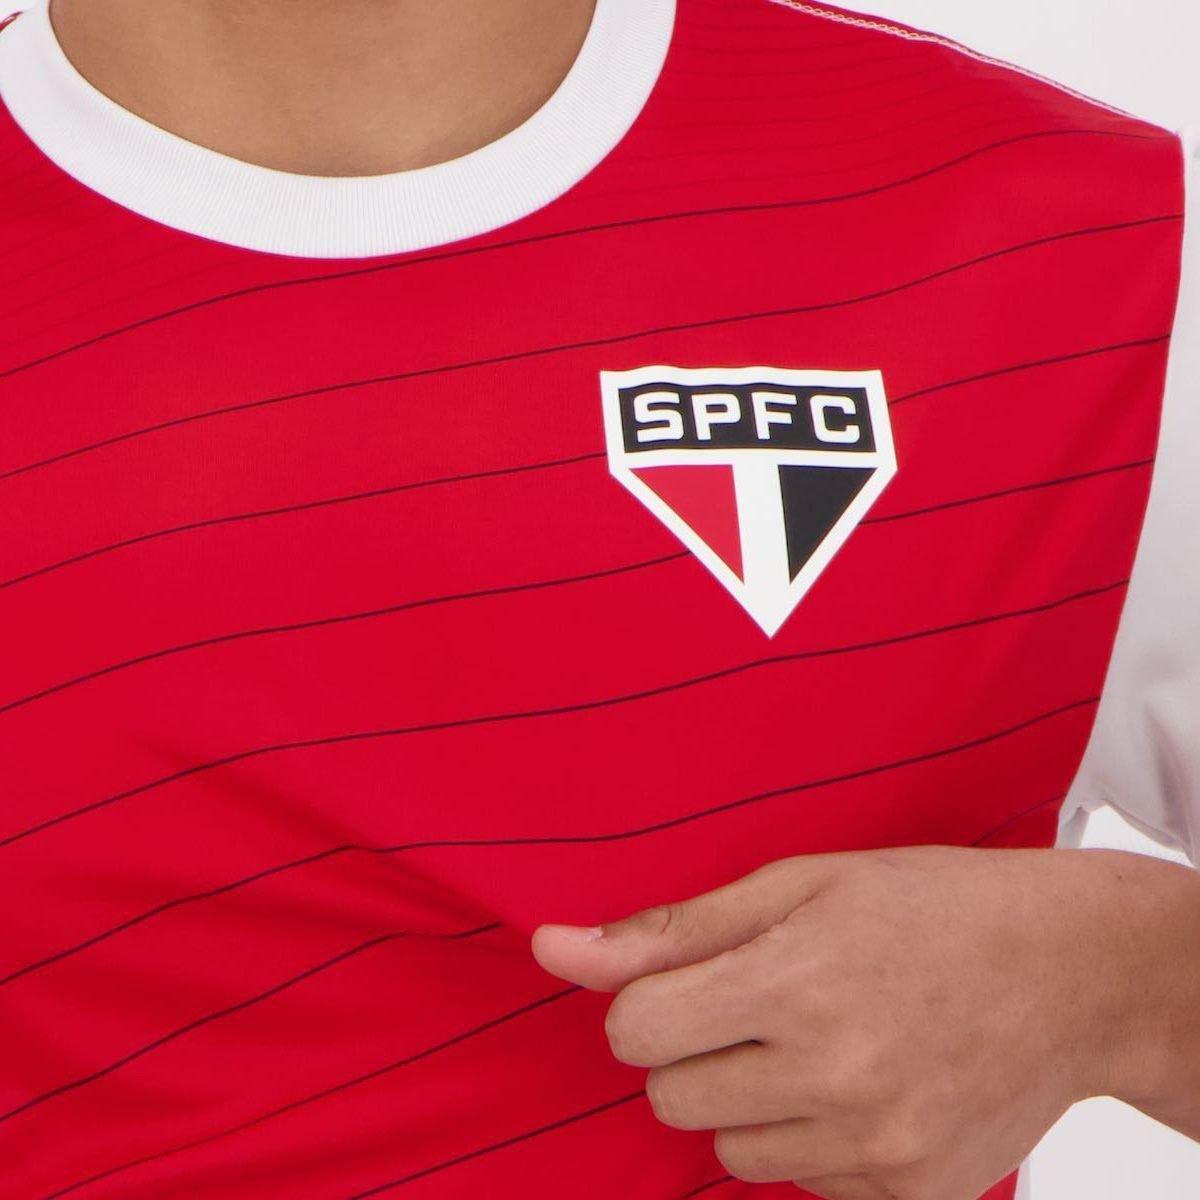 CAMISA SOVEREIGN SÃO PAULO 1904 SPR SP009